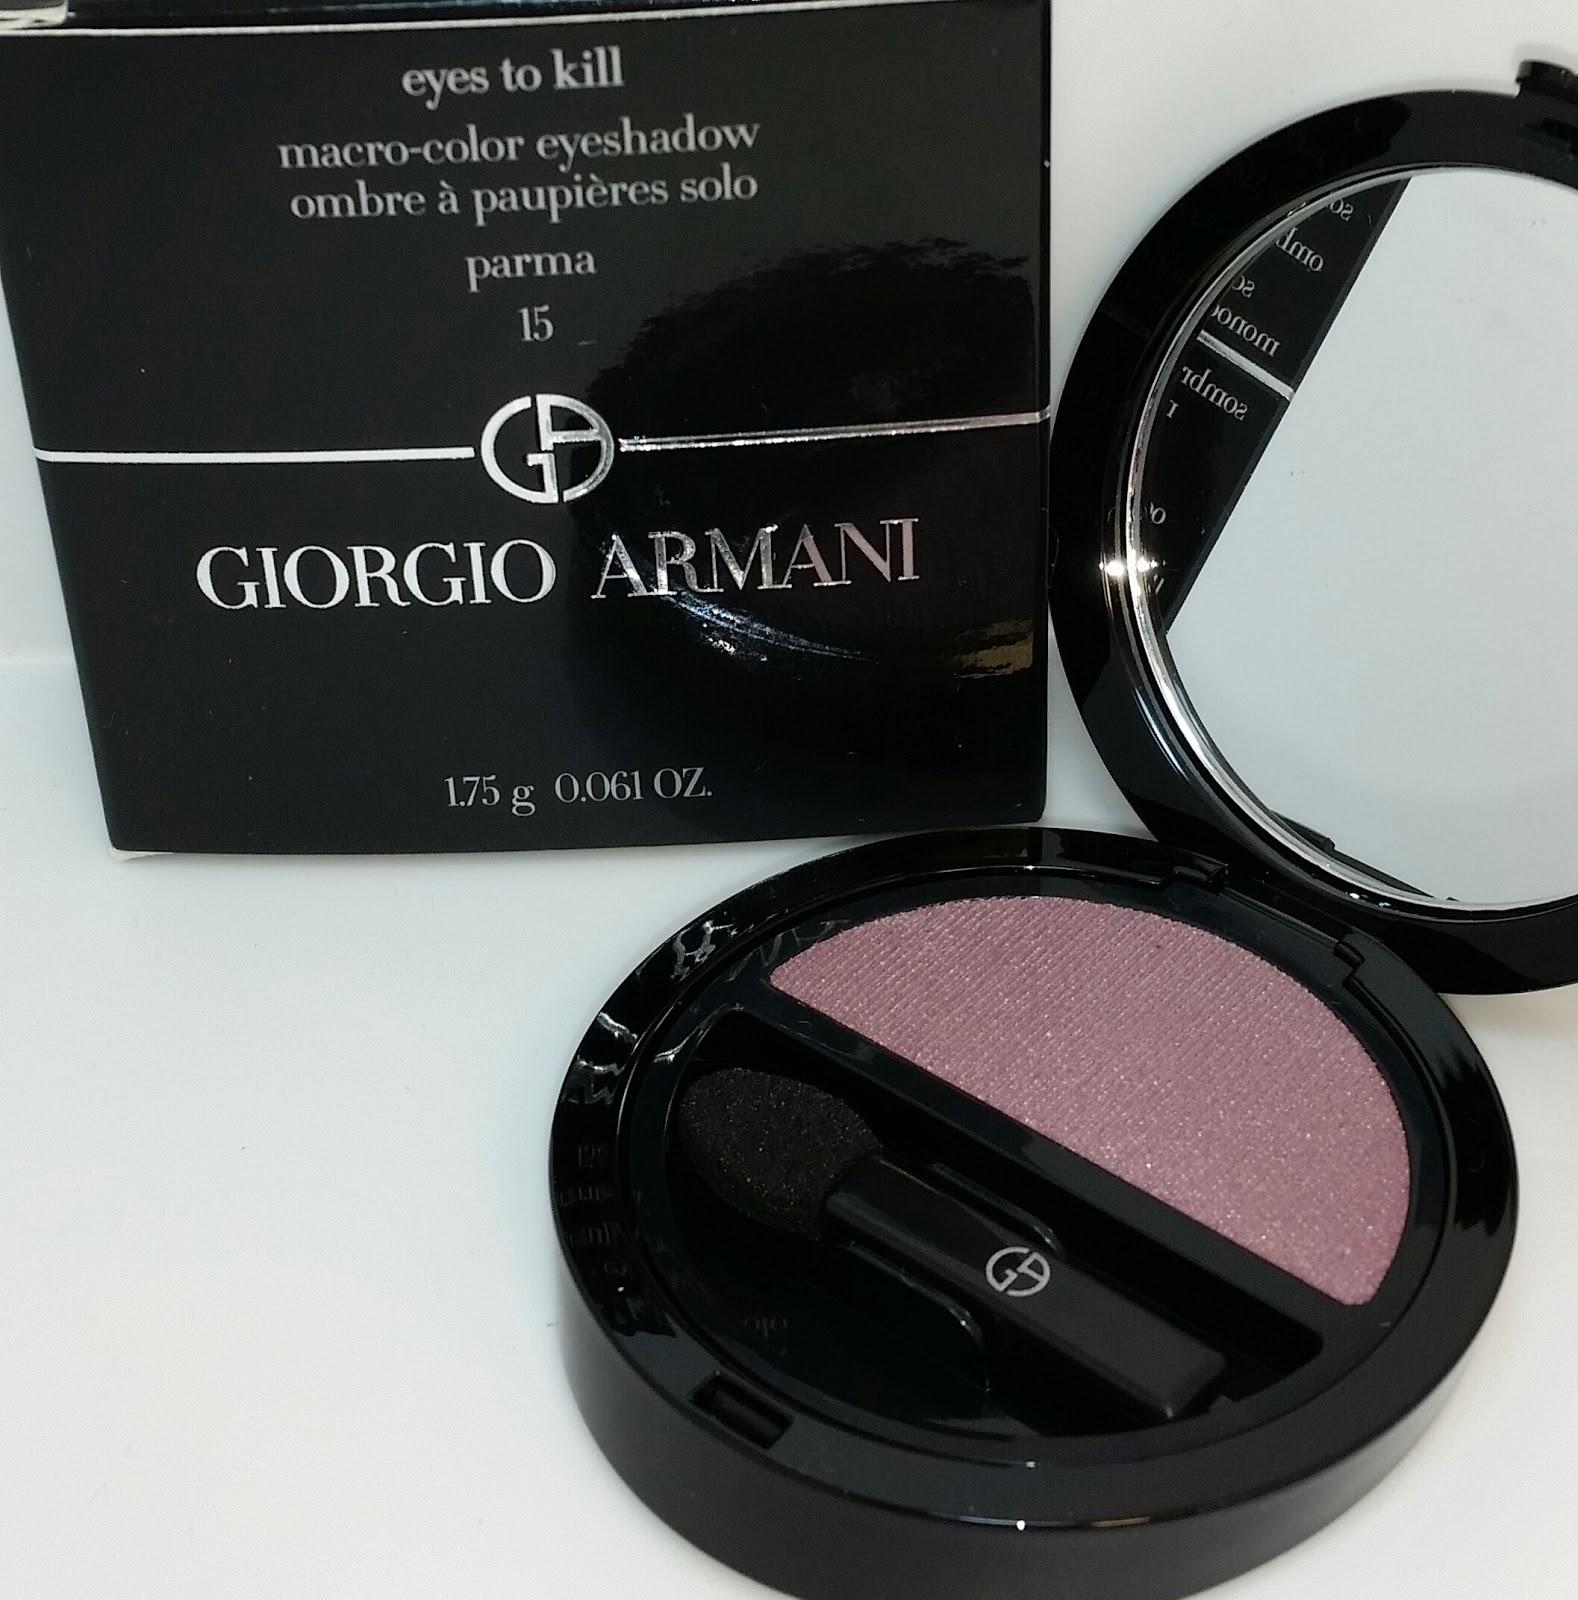 Giorgio Armani 9 Tadzio Eyes To Kill Solo Eyeshadow review